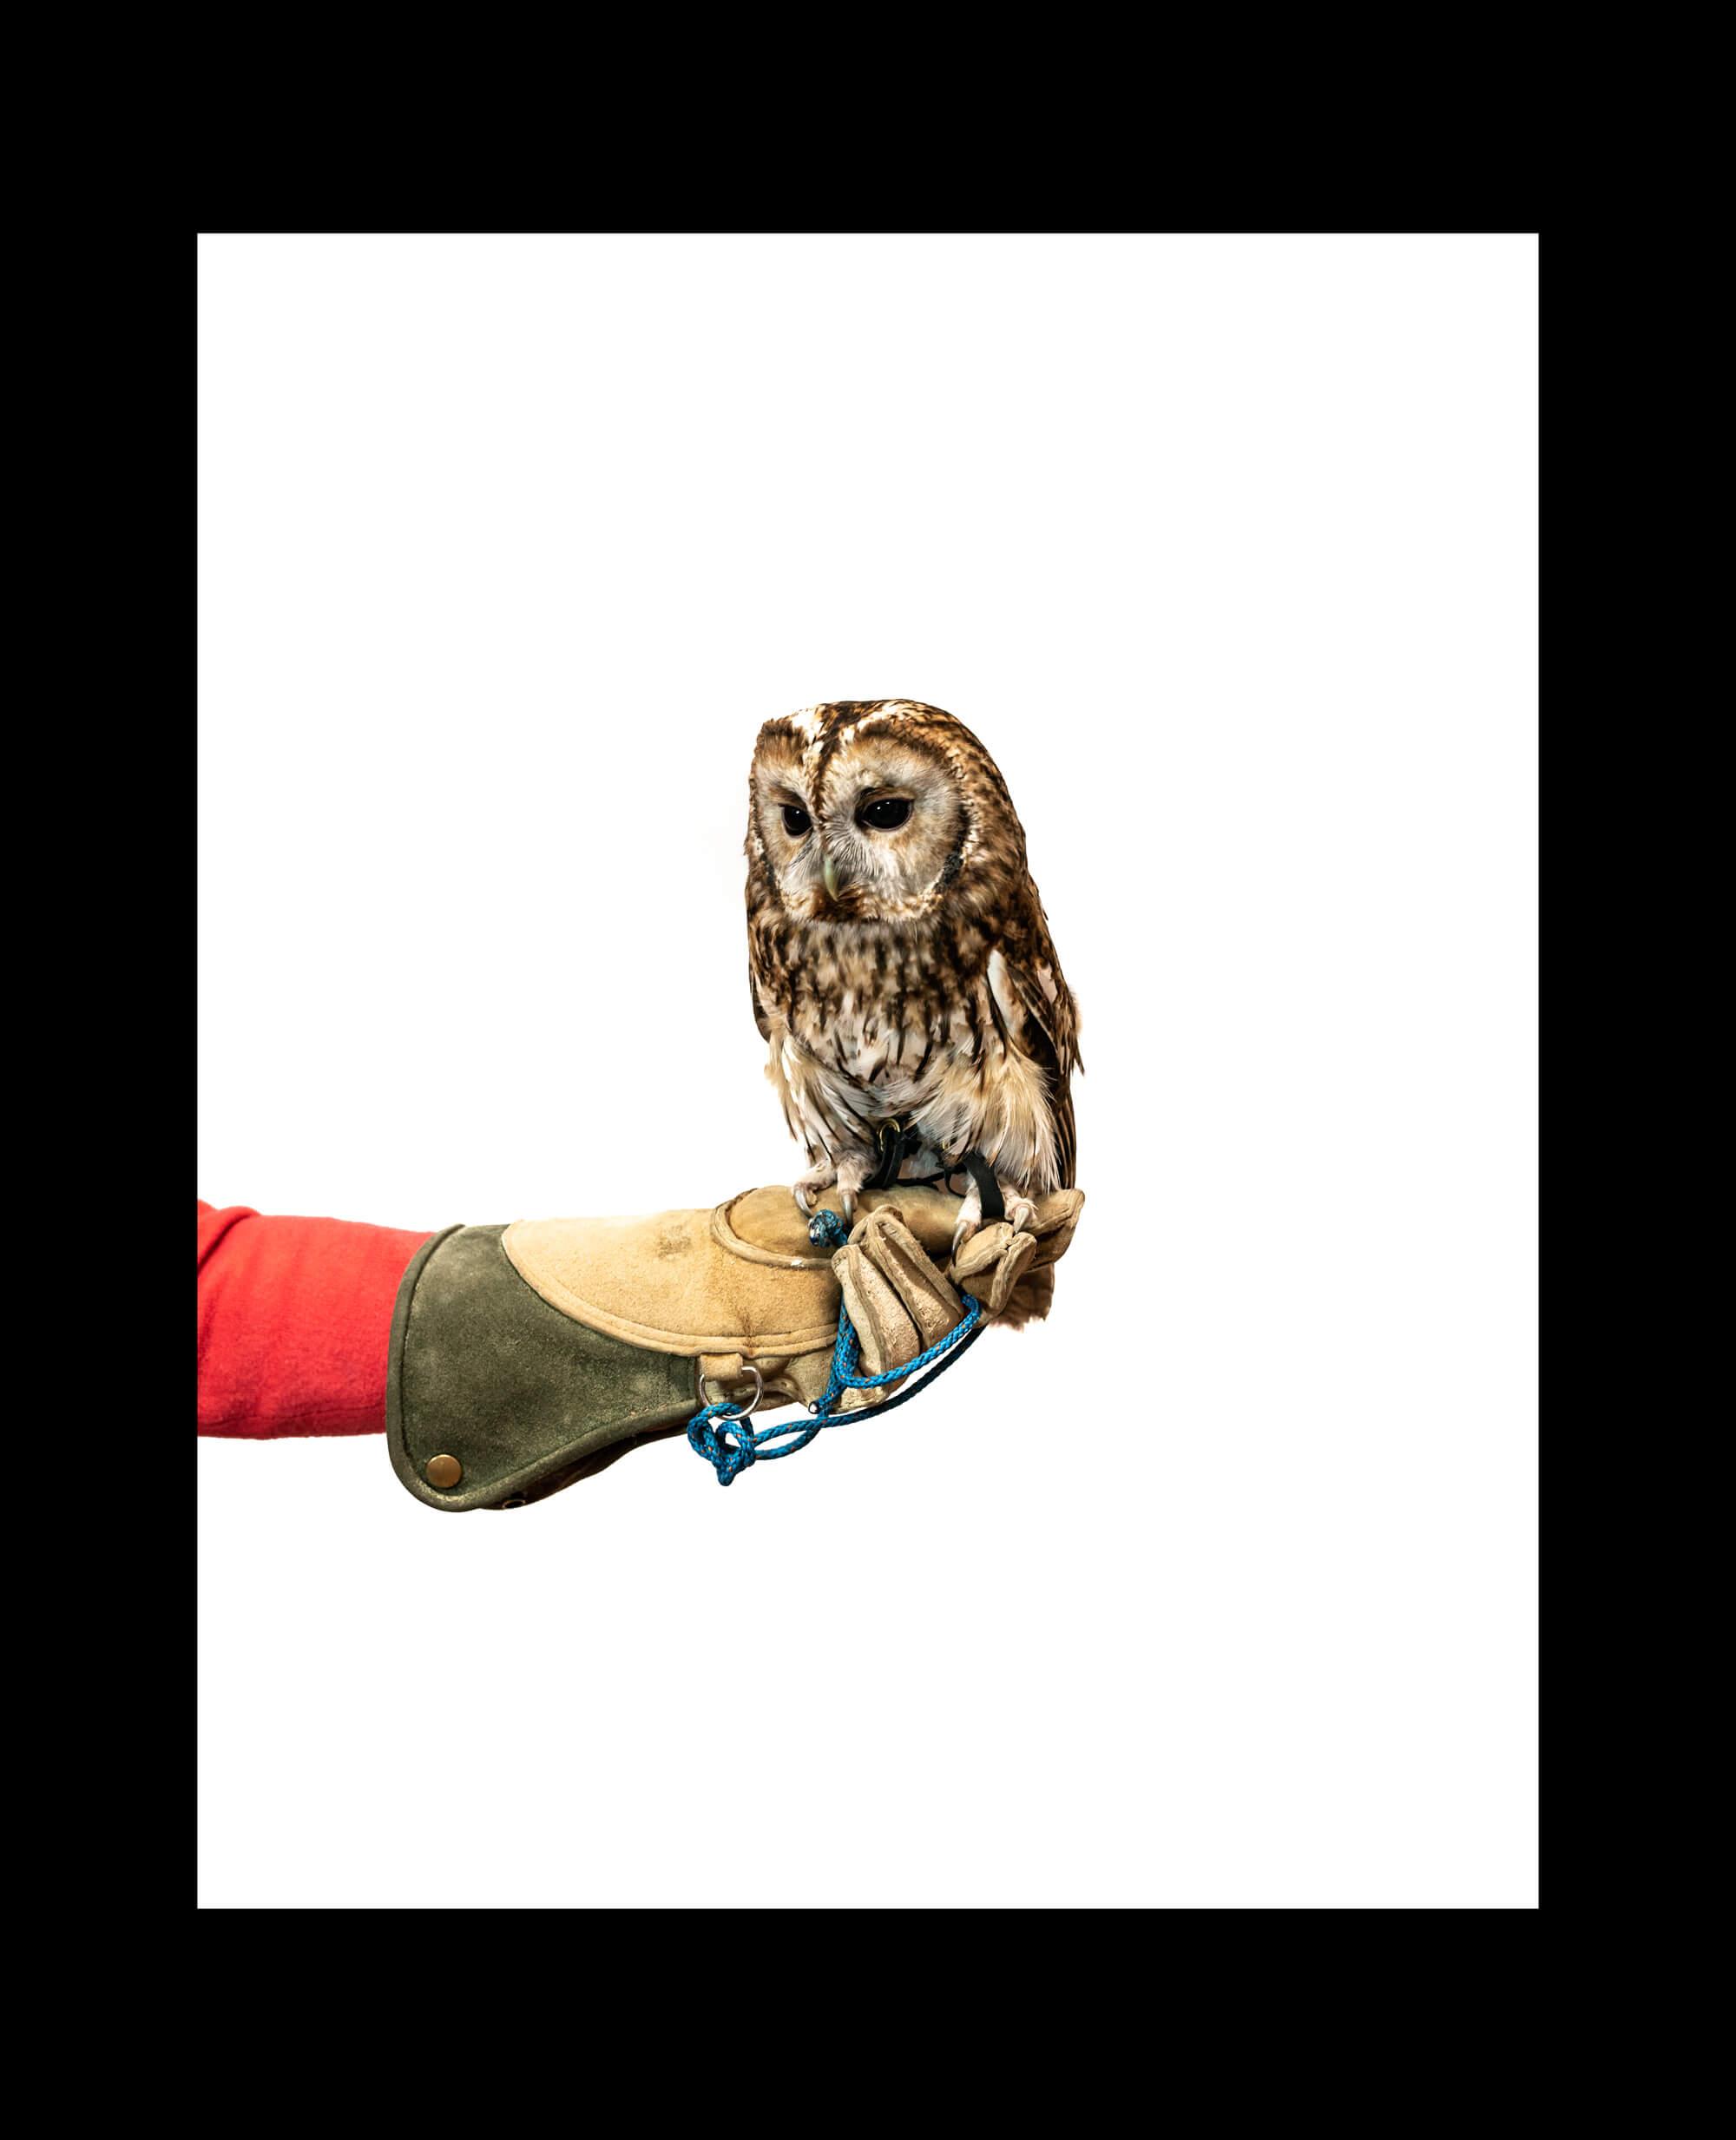 owl-border-4.jpg